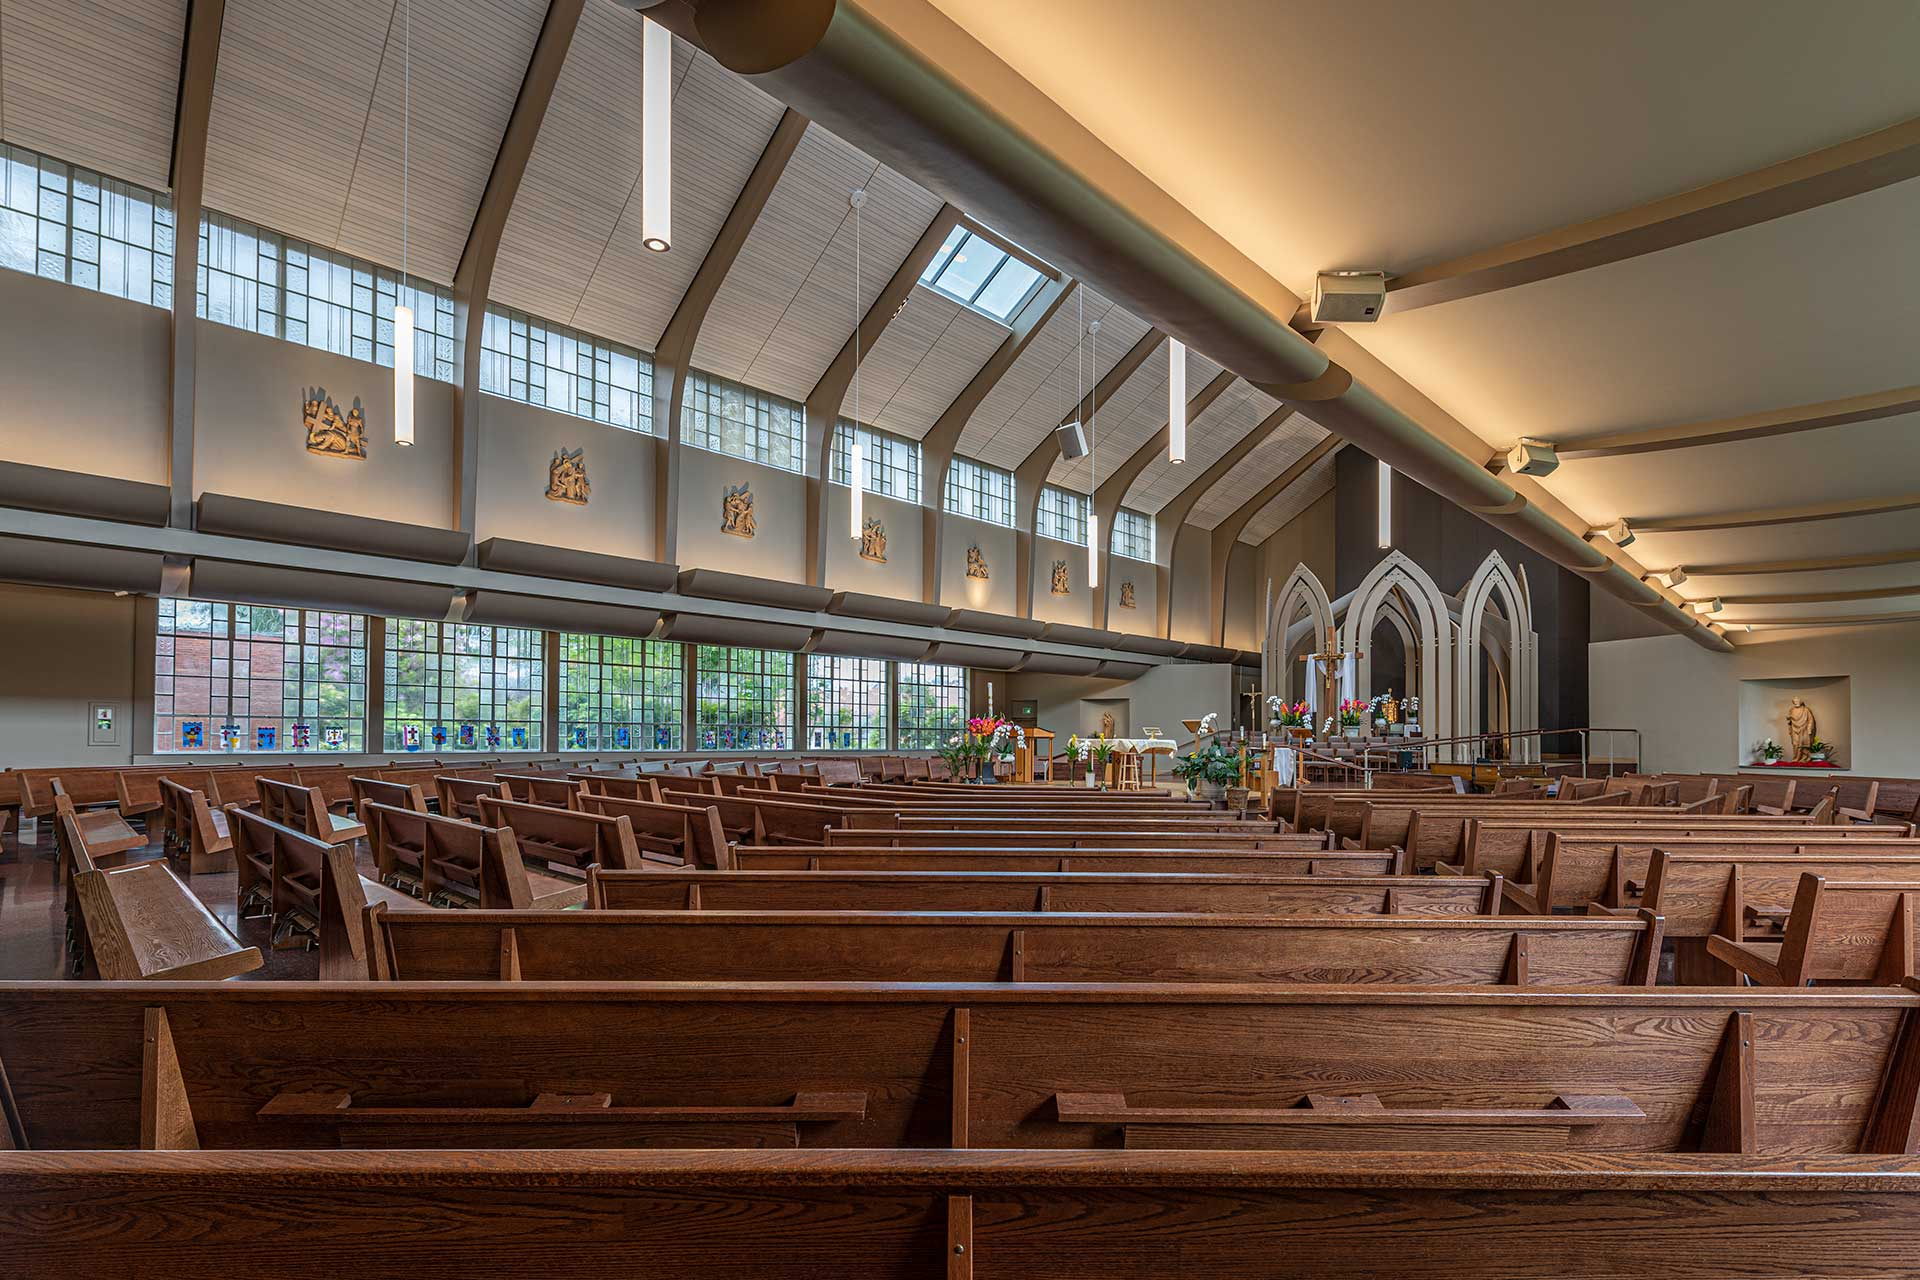 https://www.goudycc.com/wp-content/uploads/2020/12/sacred-heart-church-3.jpg